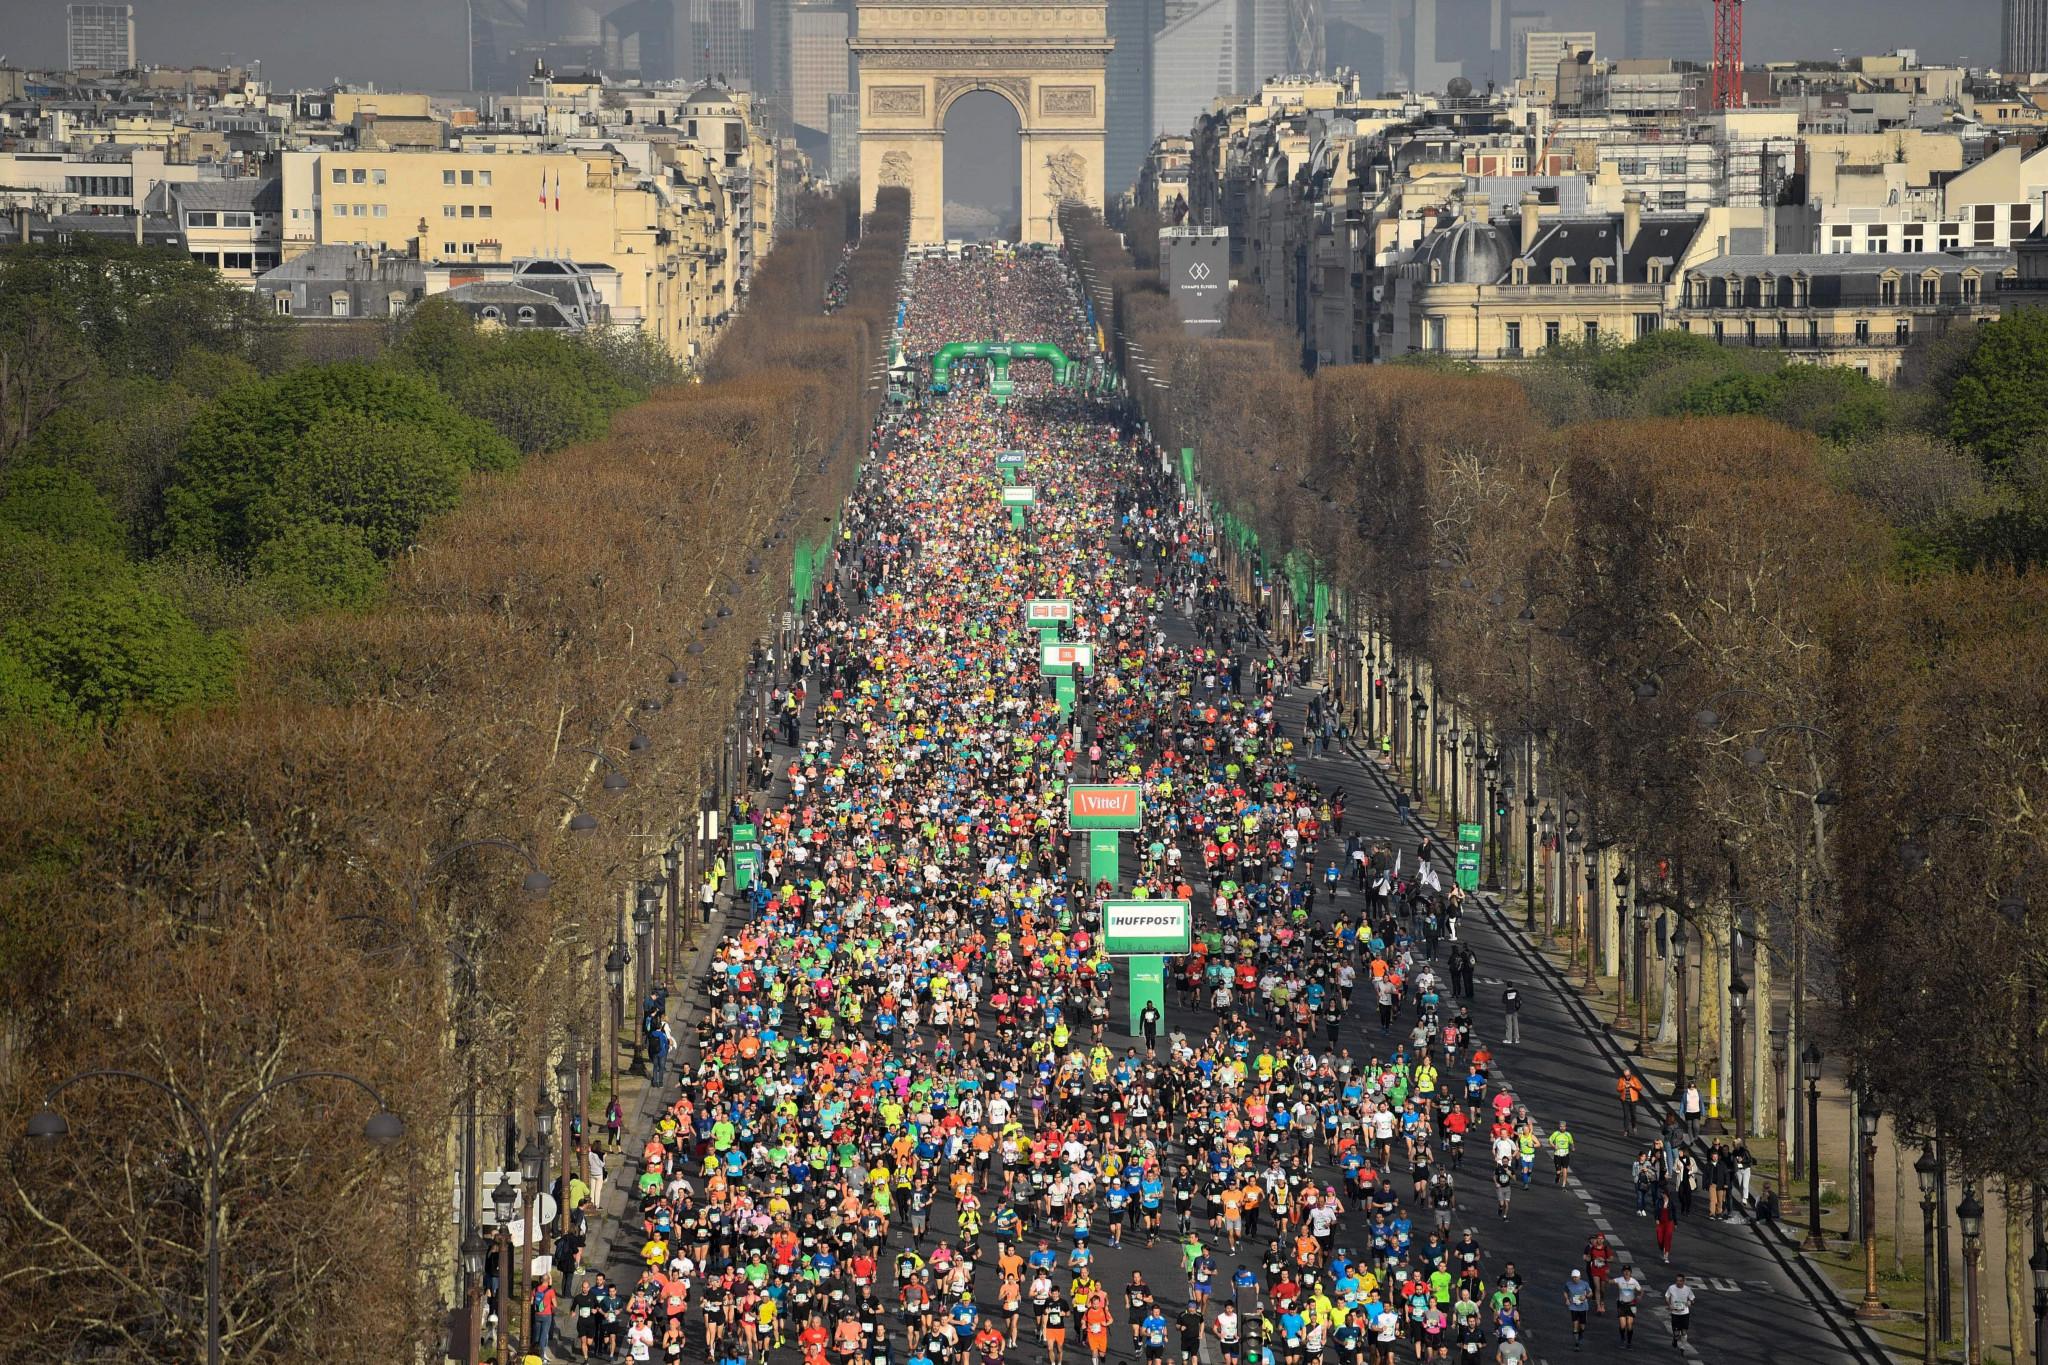 A mass participation marathon is set to be held at Paris 2024 ©Getty Images